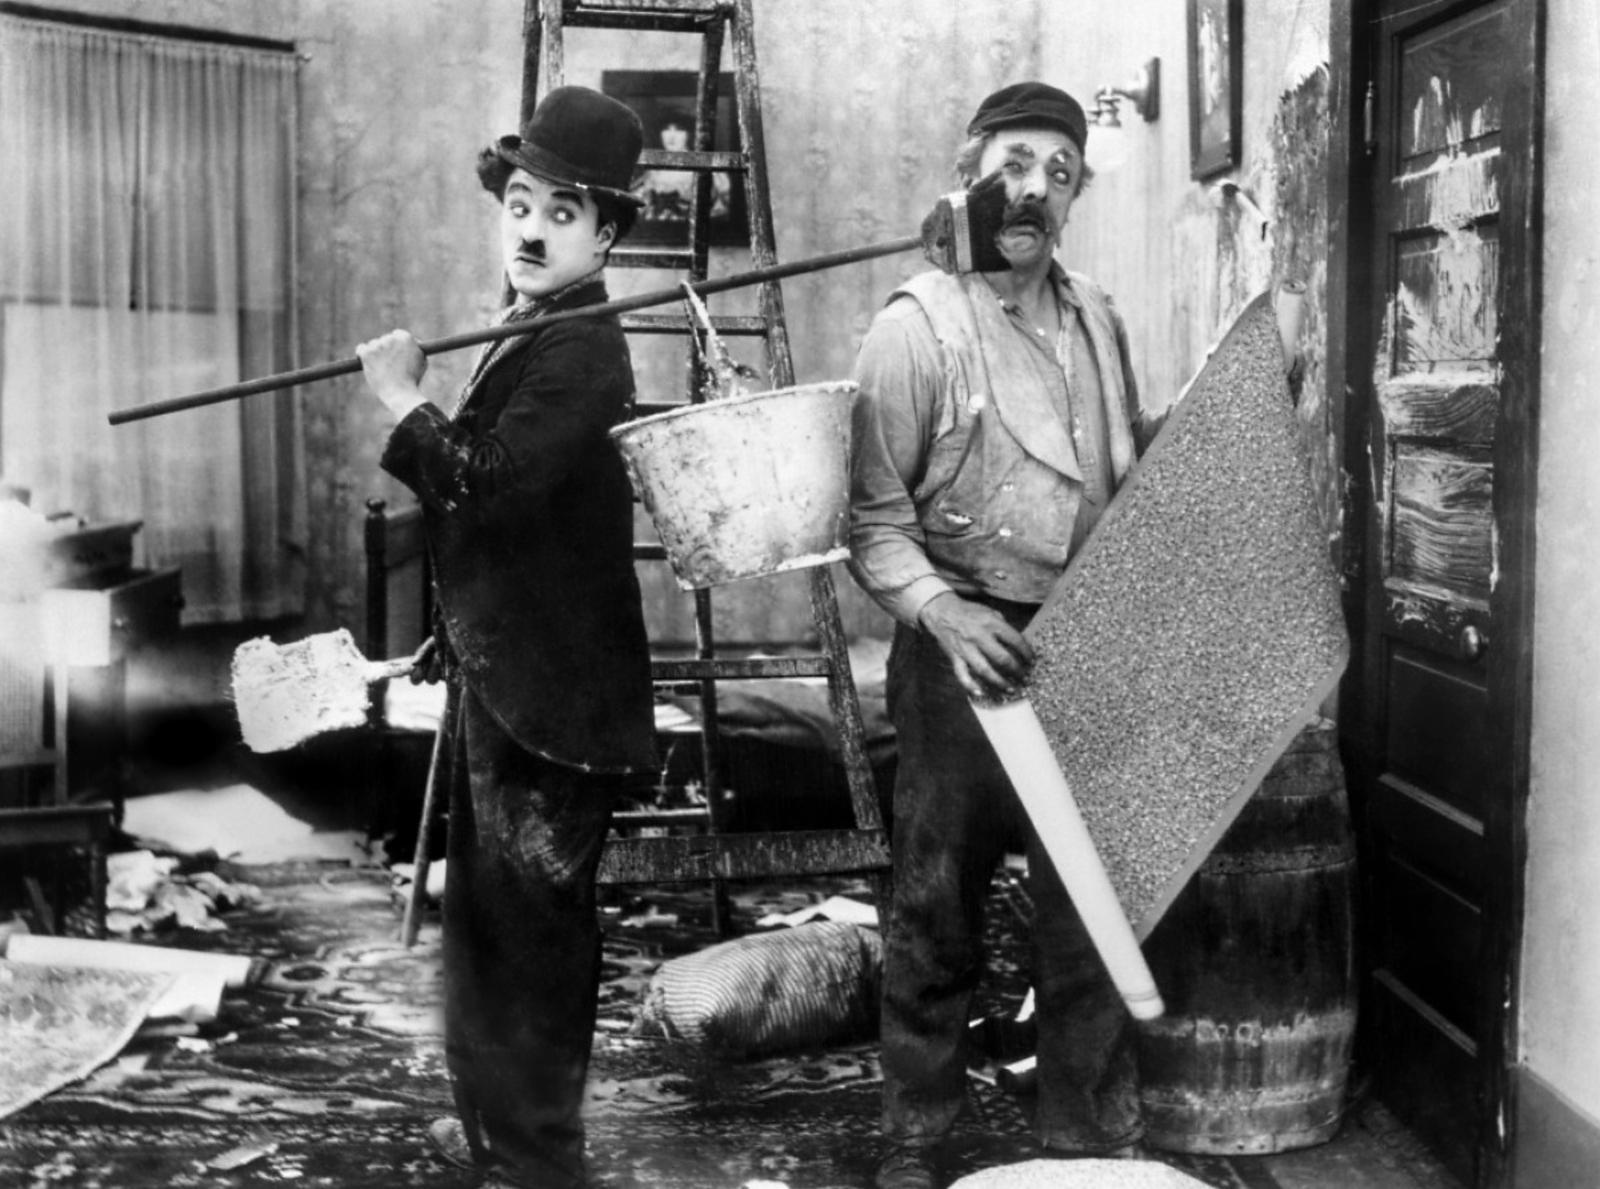 Charlie Chaplin with Bud Jamison (R)